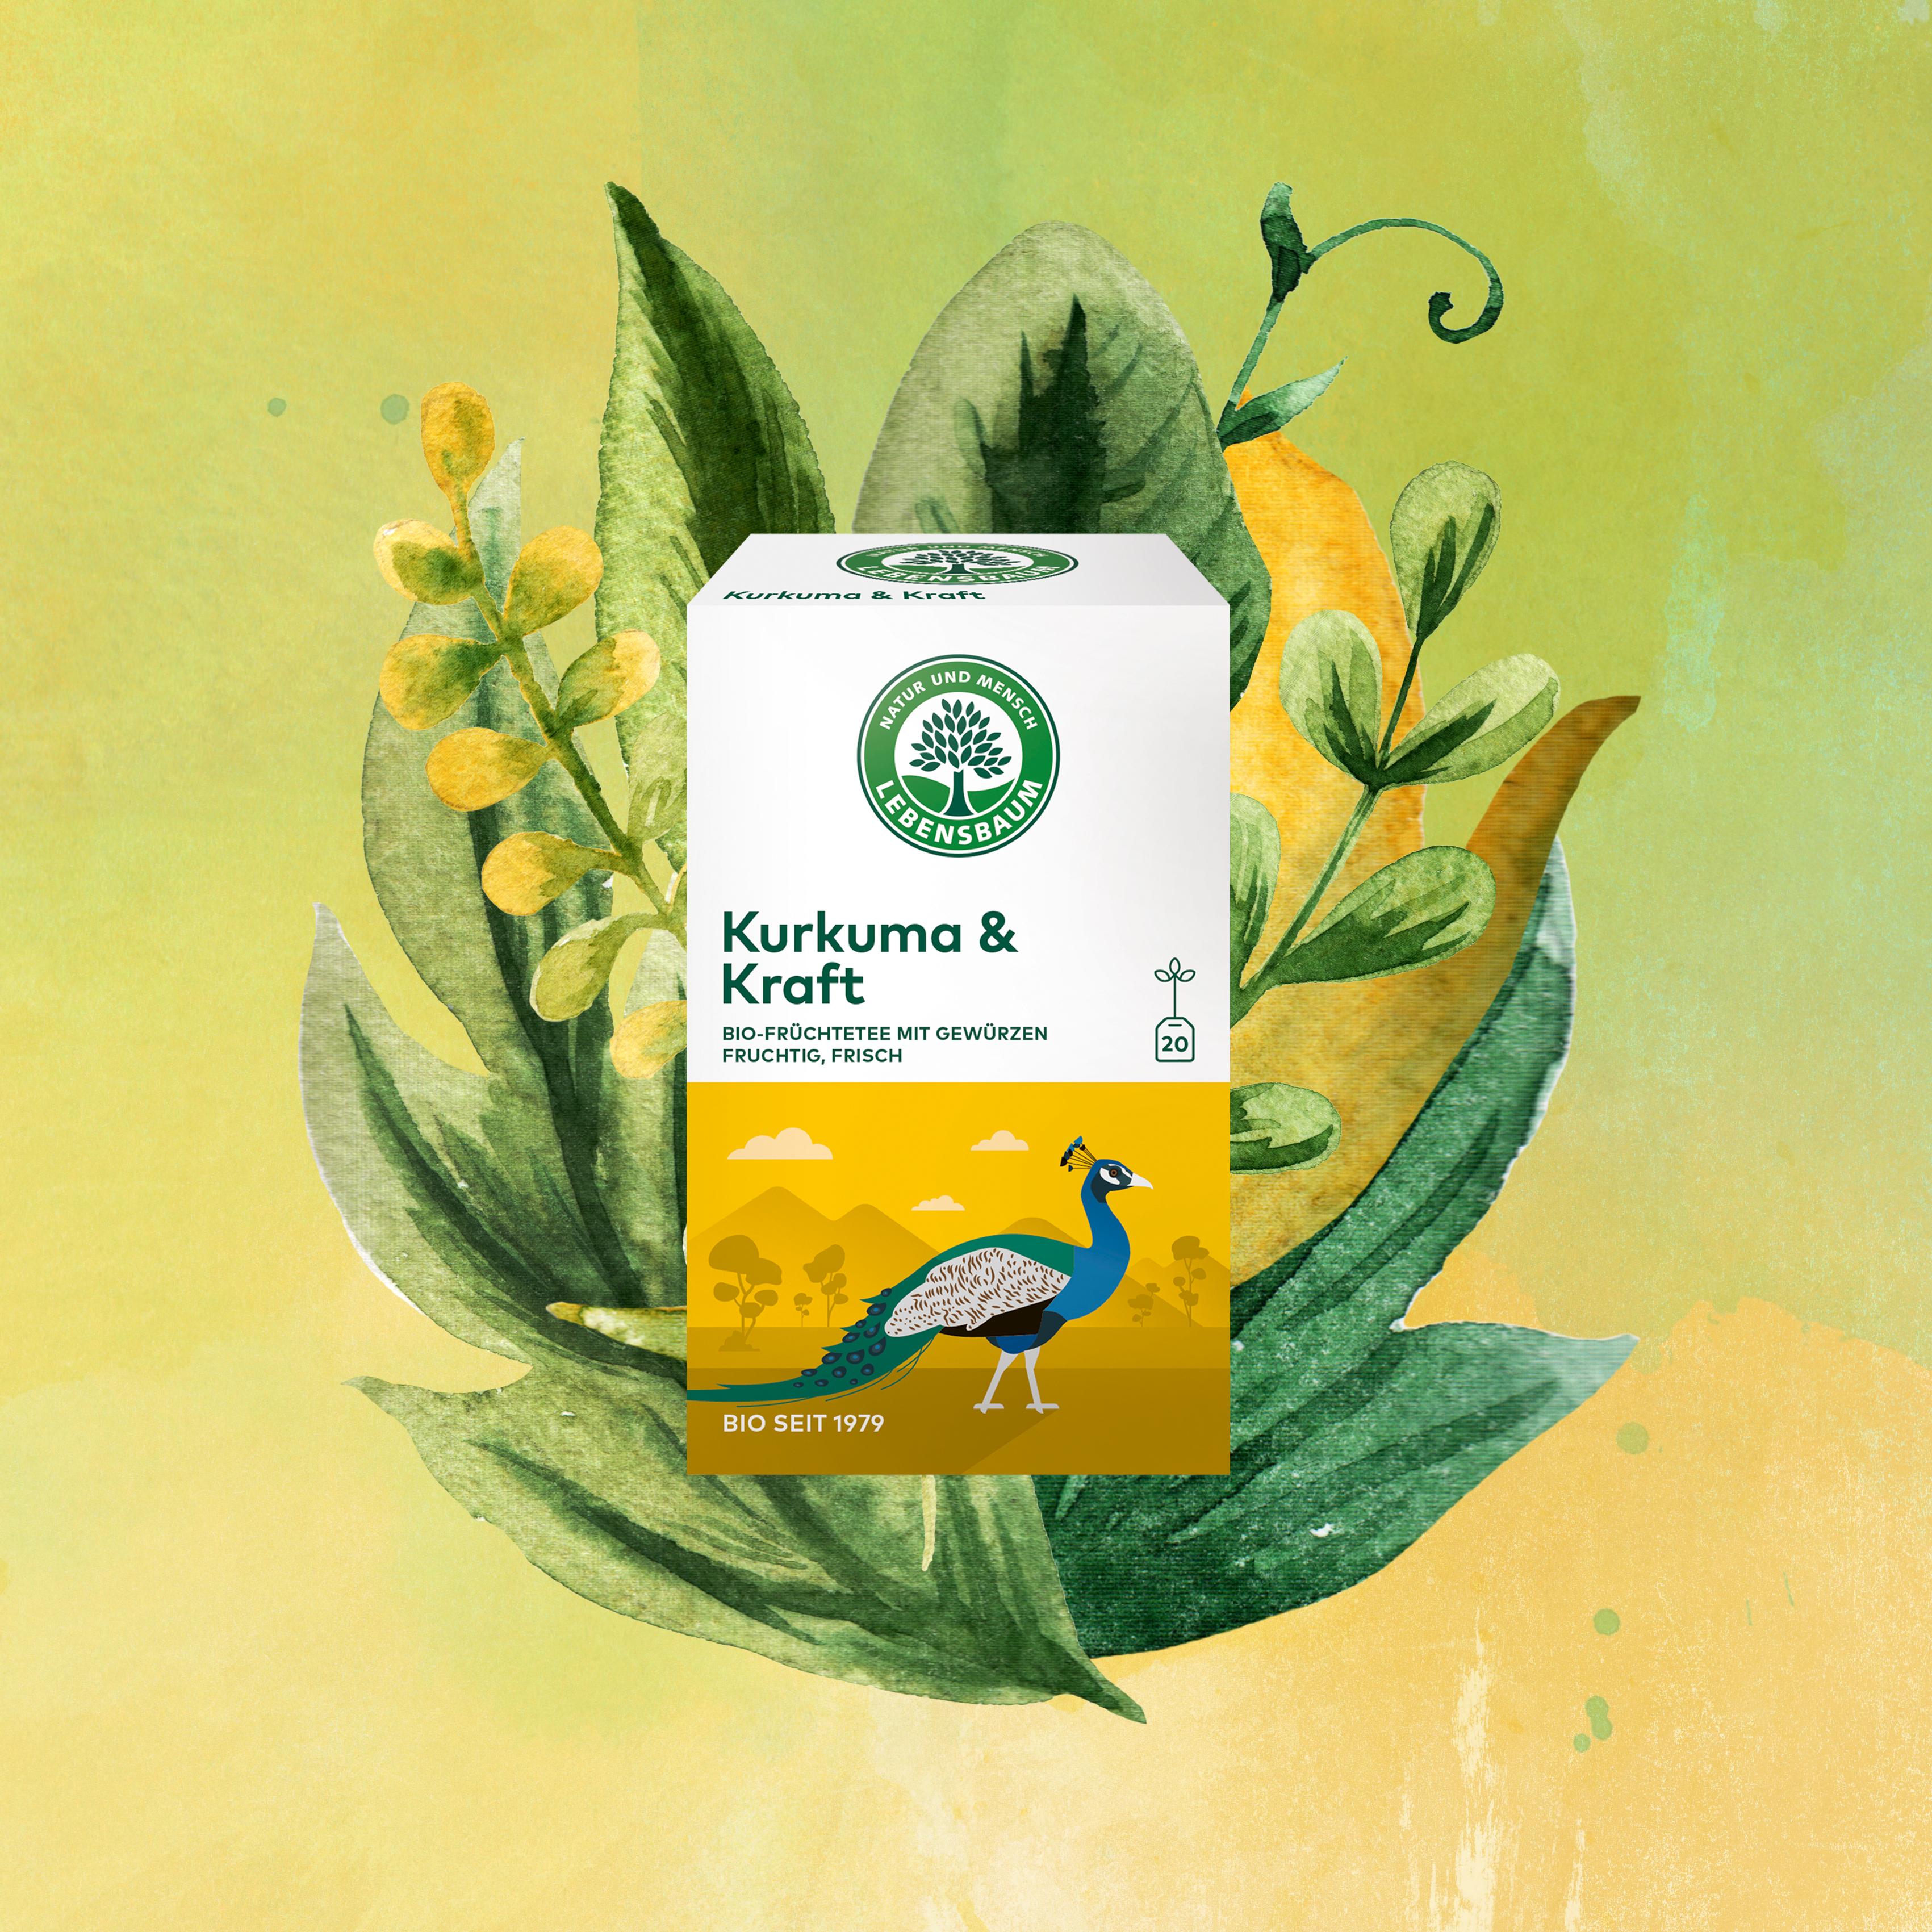 Lebensbaum Wanderlust Kurkuma & Kraft Golden Milk